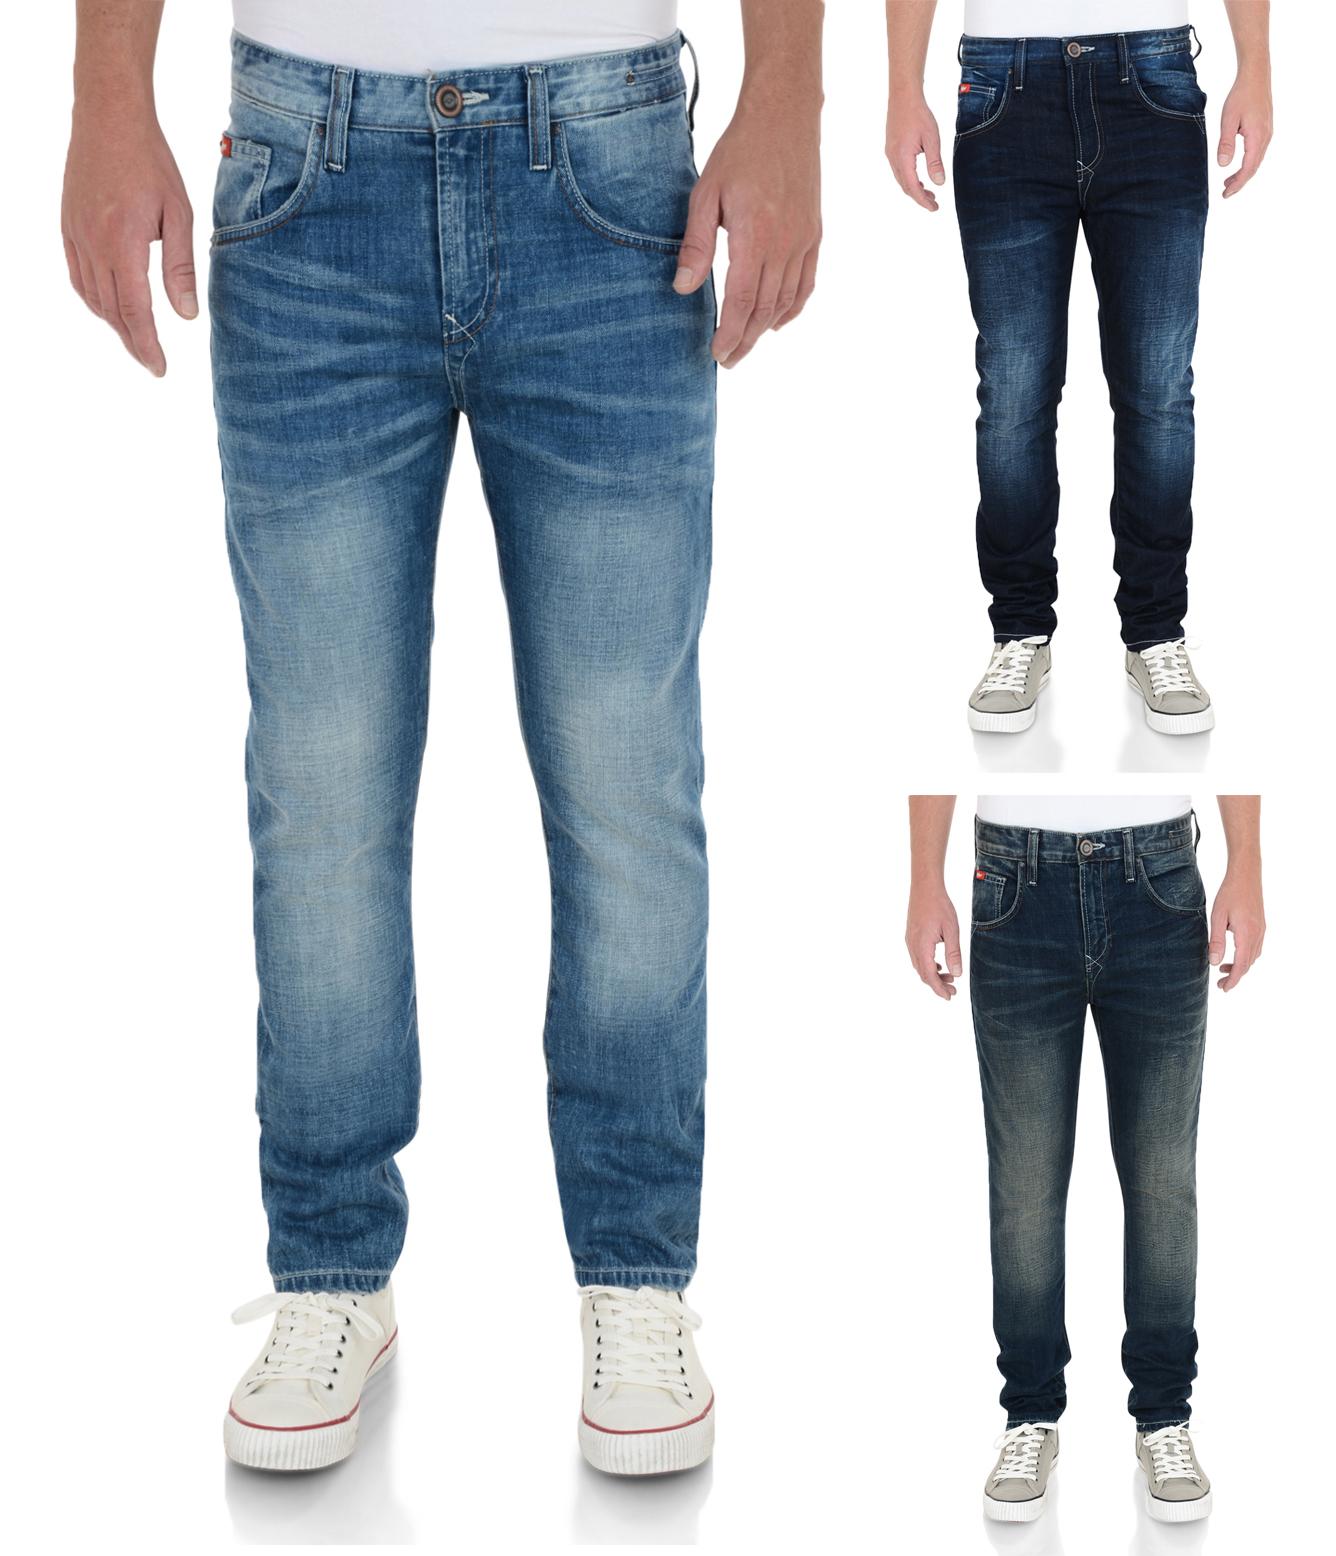 3fe55400 Lee Cooper Jeans Men's New Vintage Faded Denim Pants Straight Slim ...